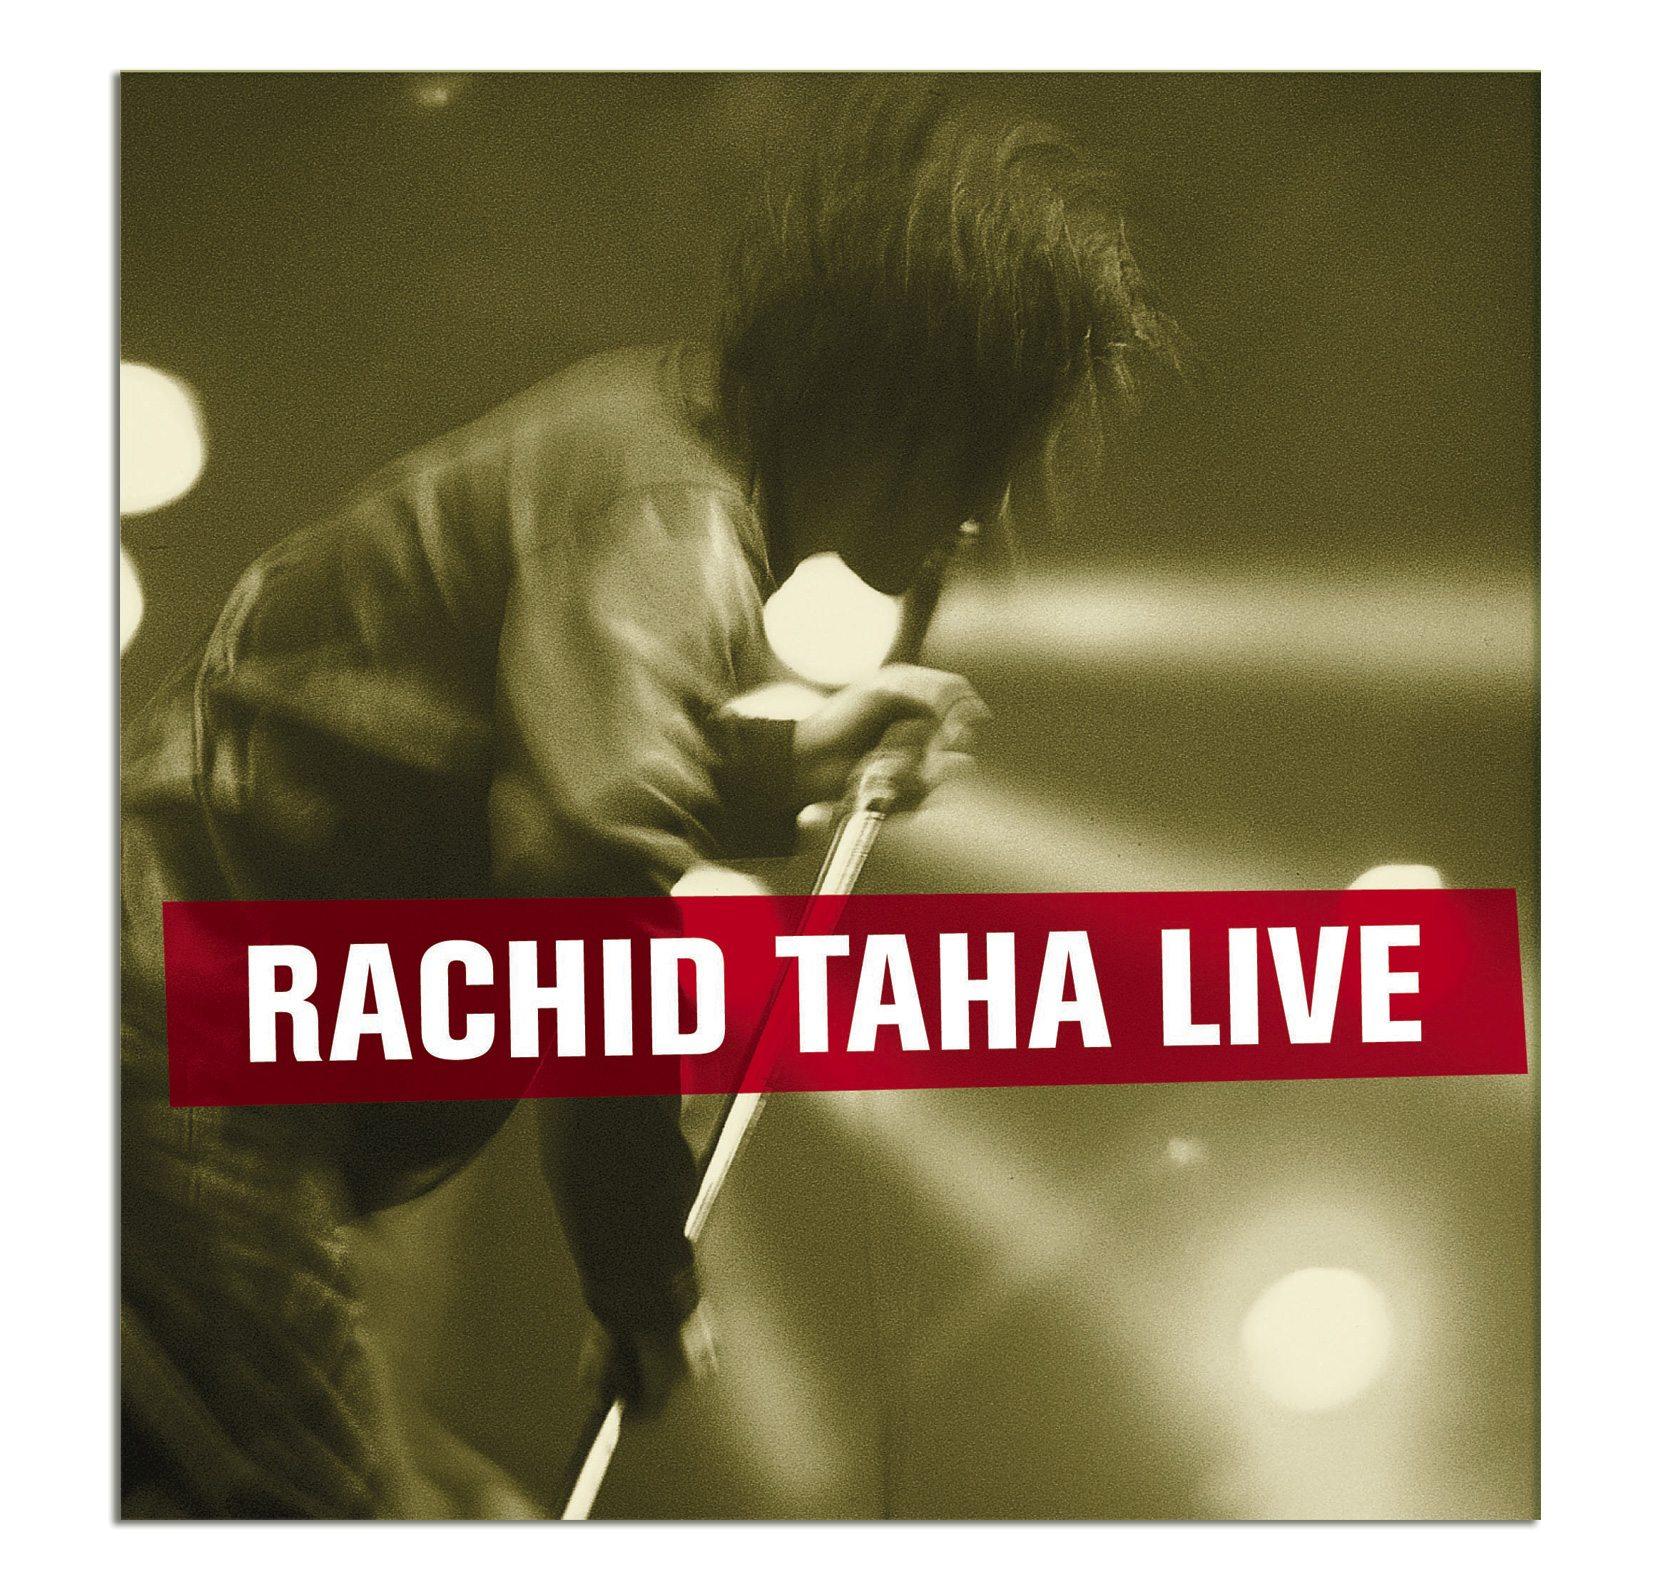 Rachid-TAHA-live